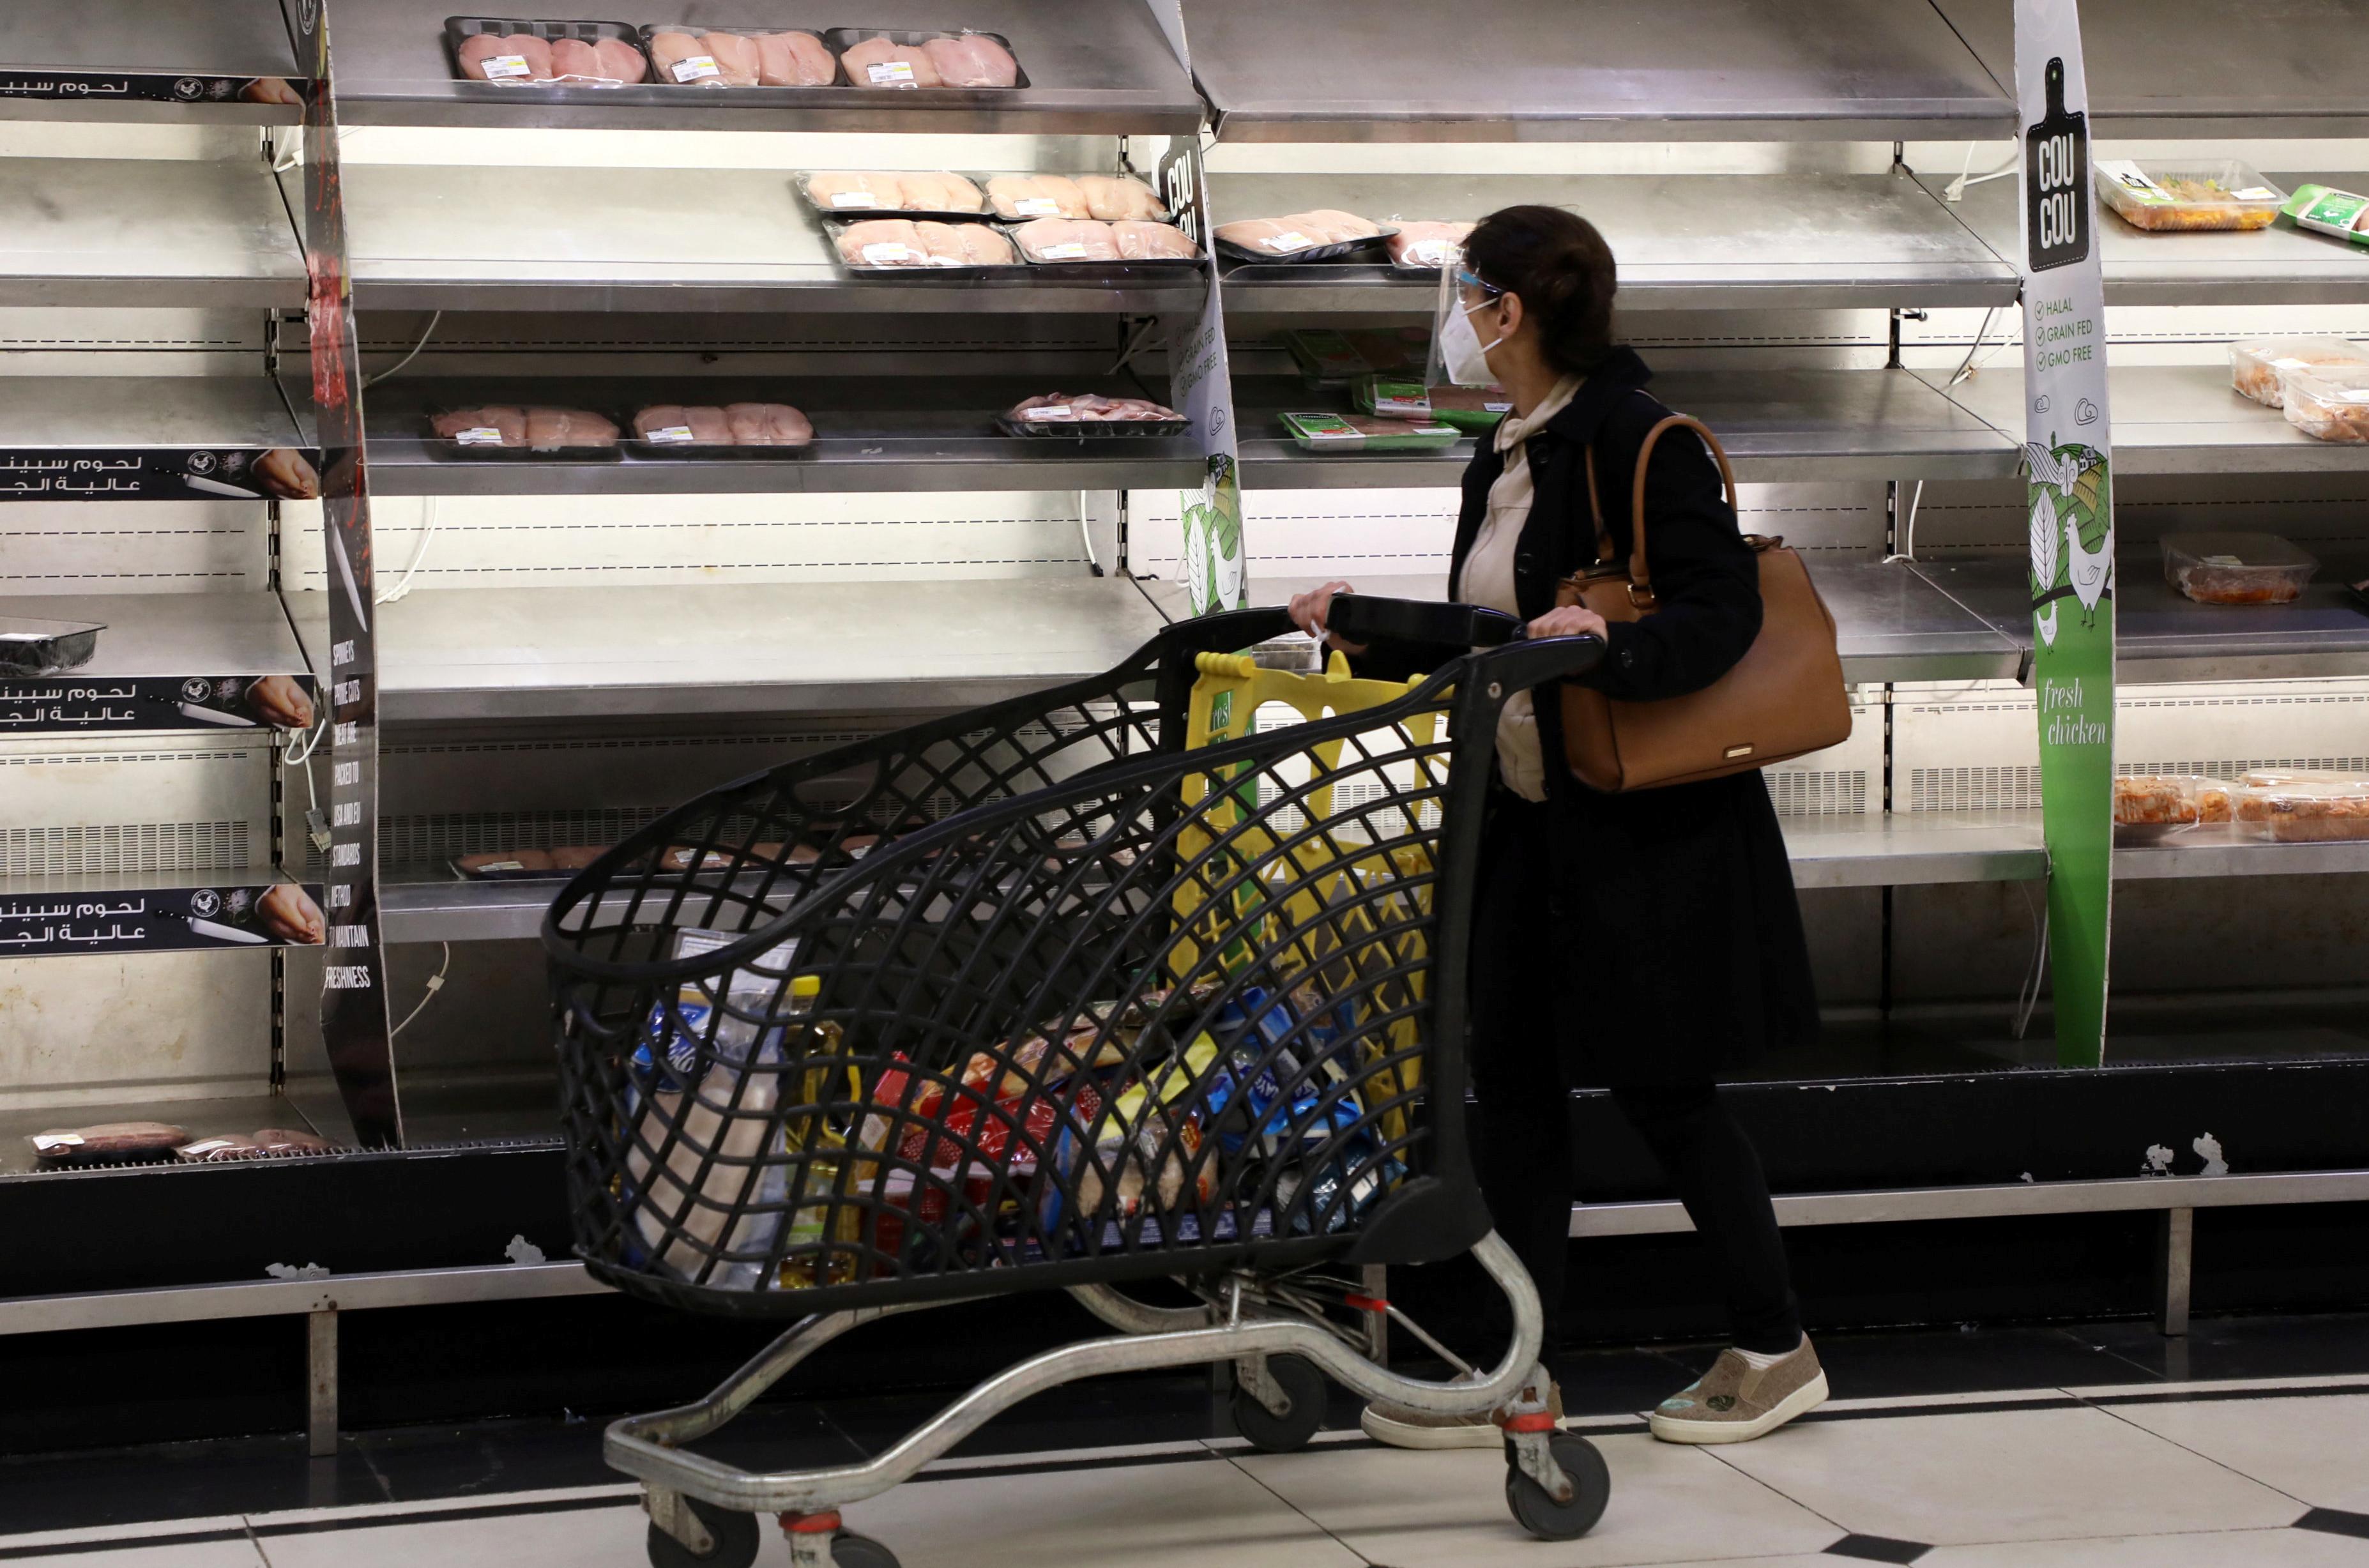 A shopper walks past near-empty shelves at a supermarket in Beirut, Lebanon